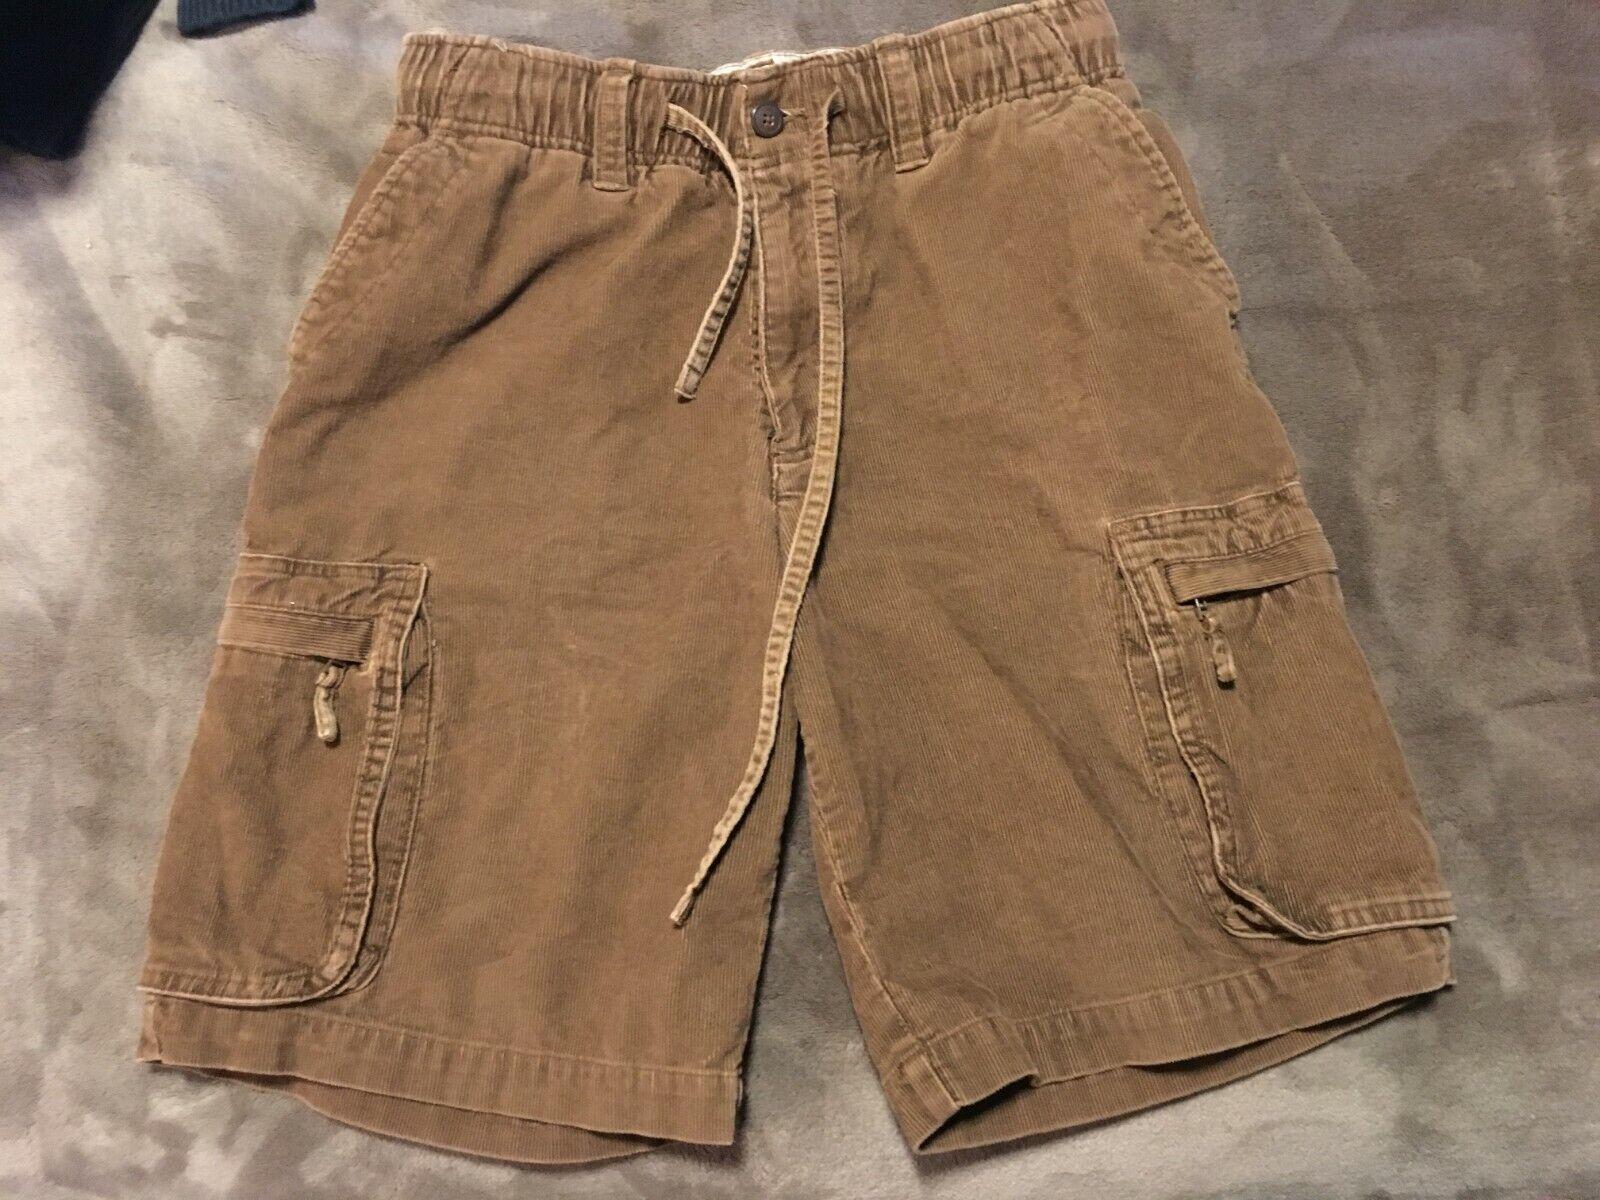 Vintage Op Ocean Pacific Corduroy Mens Shorts Size S 28-30